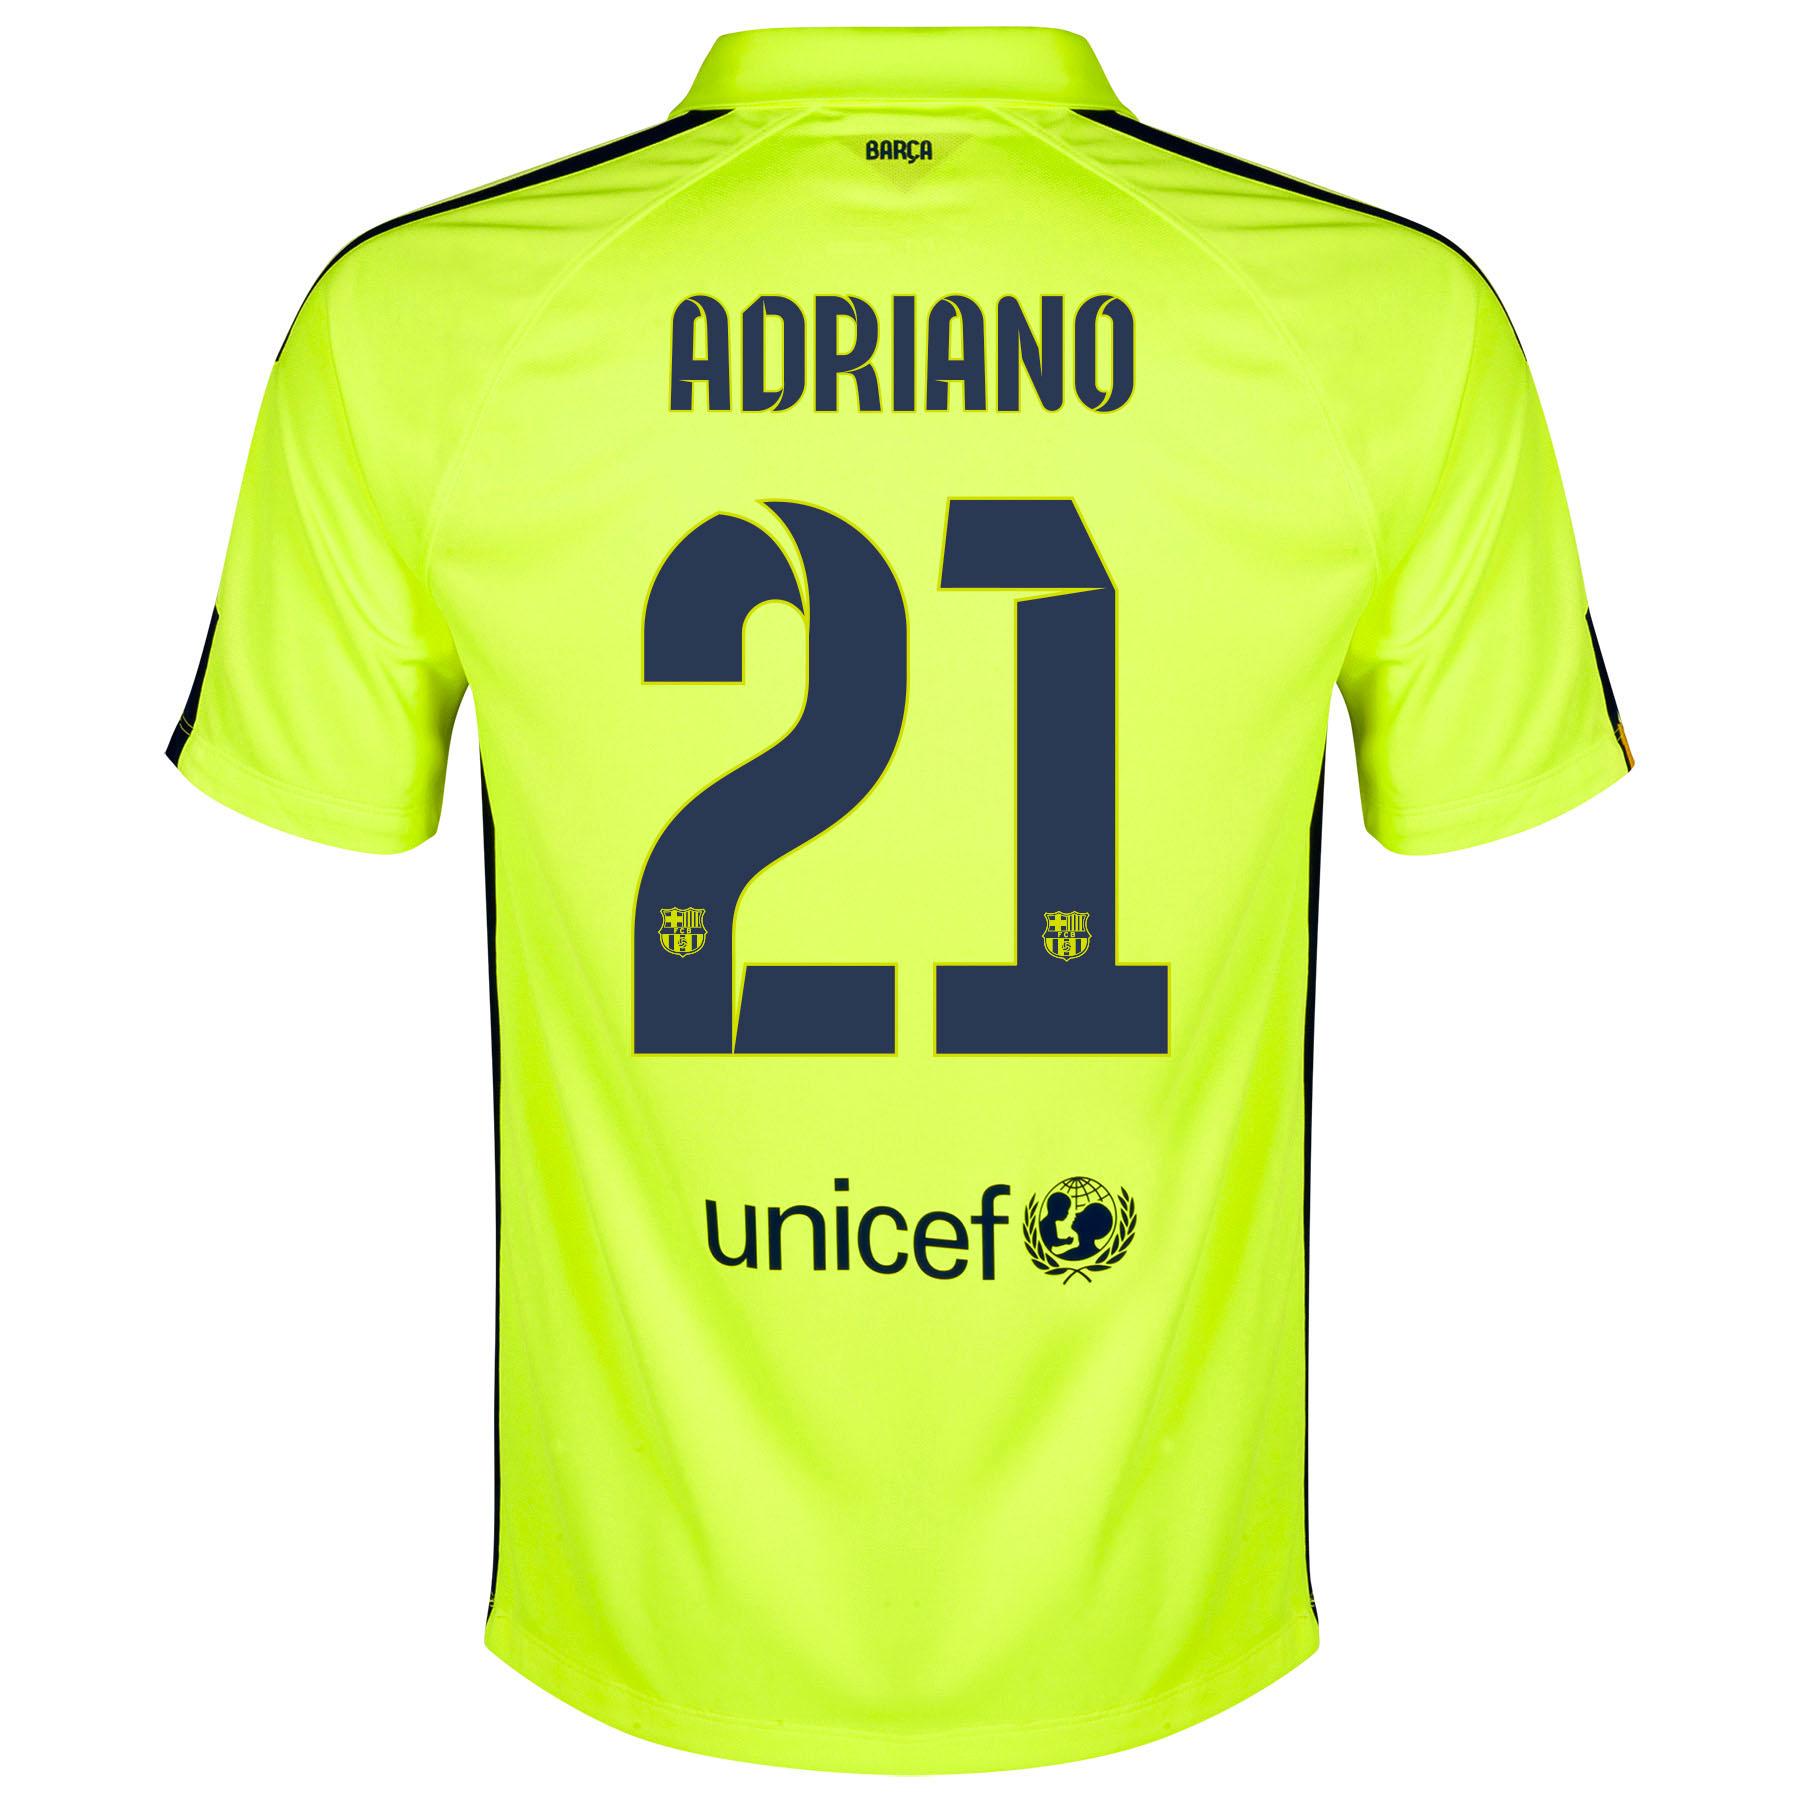 Barcelona Third Shirt 2014/15 Yellow with Adriano 21 printing